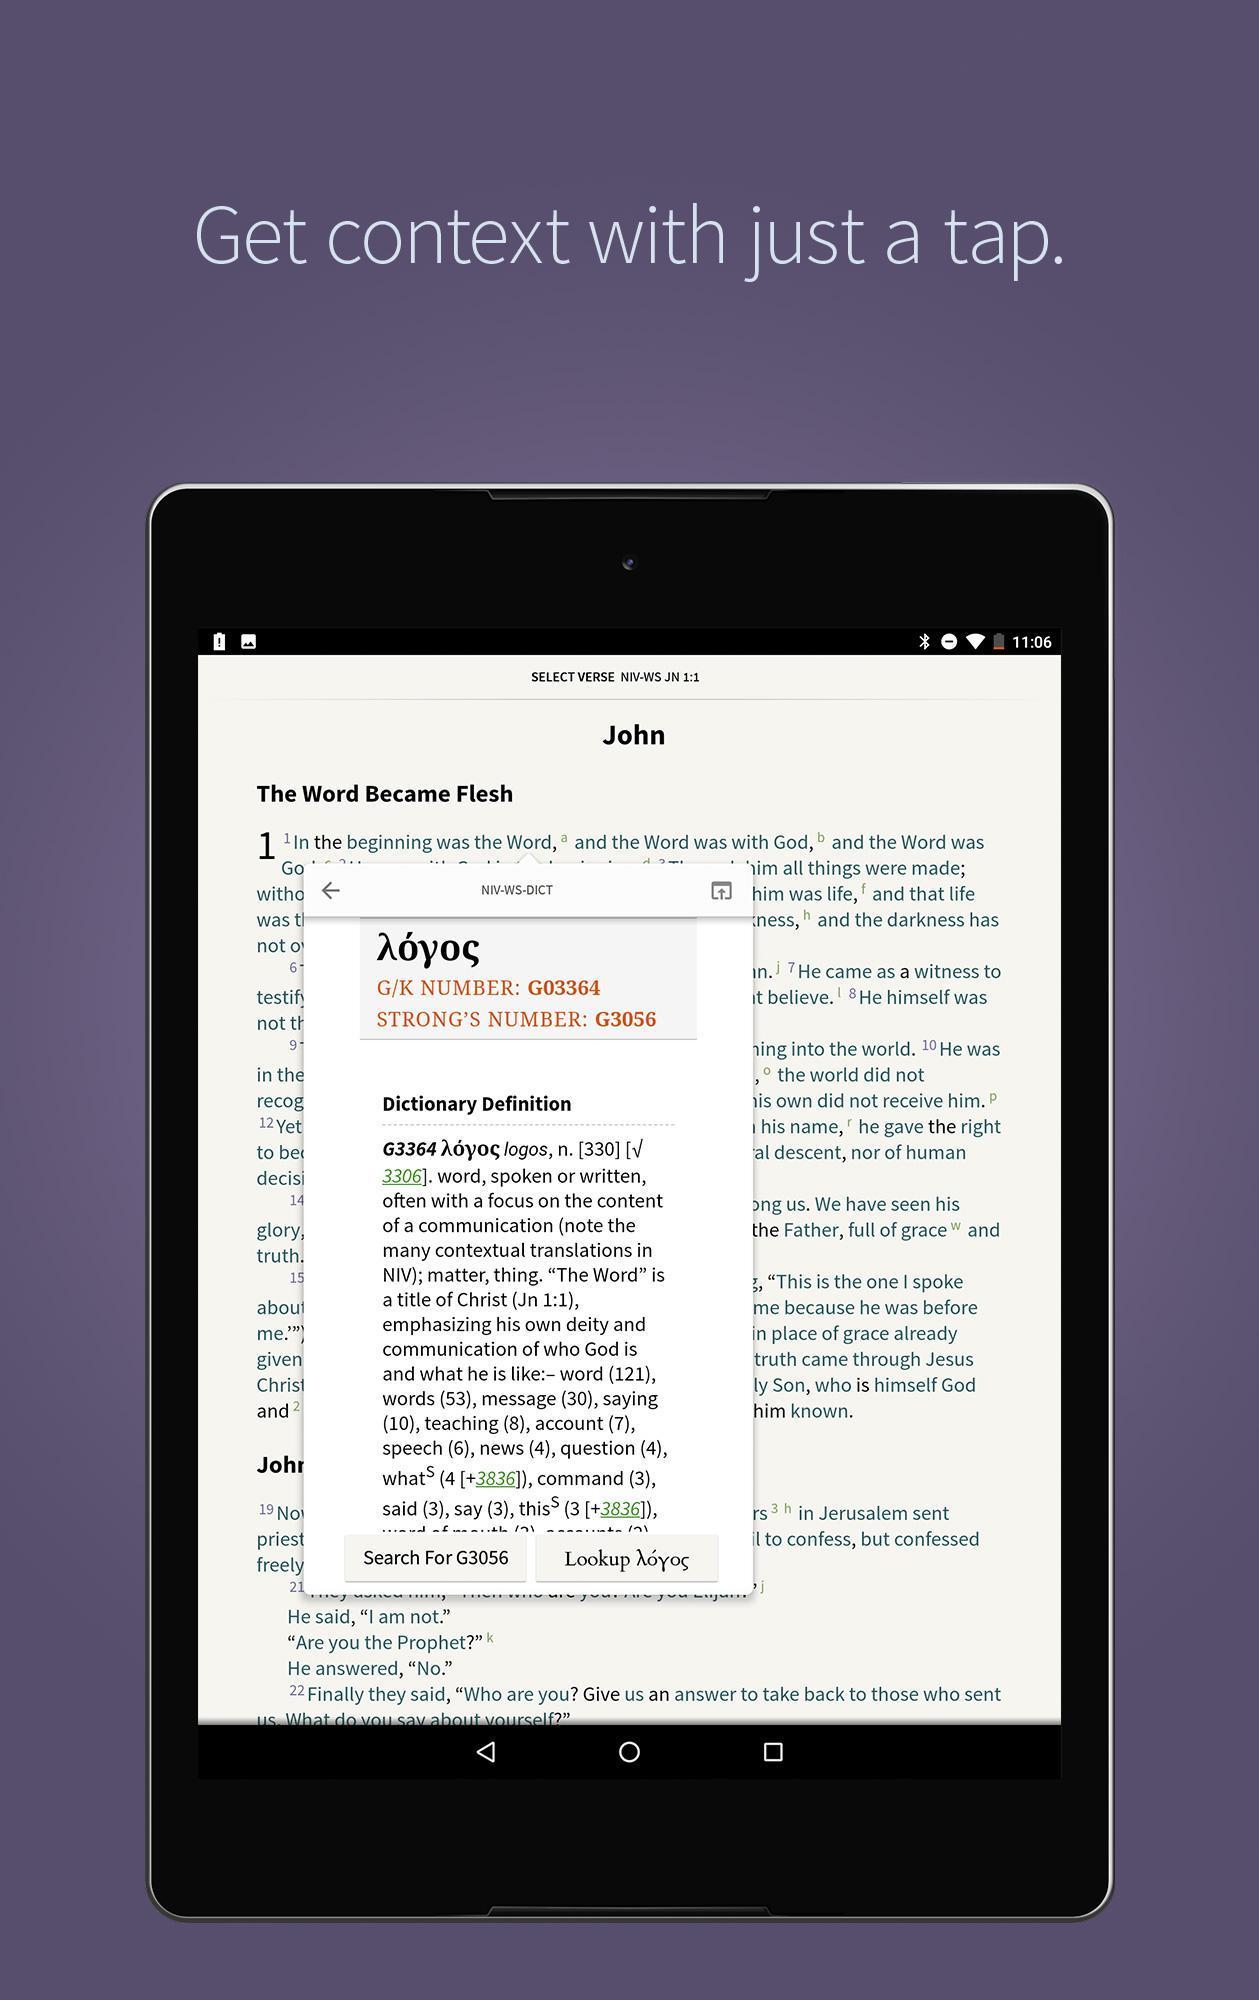 Bible App by Olive Tree 7.5.4.0.5664 Screenshot 16